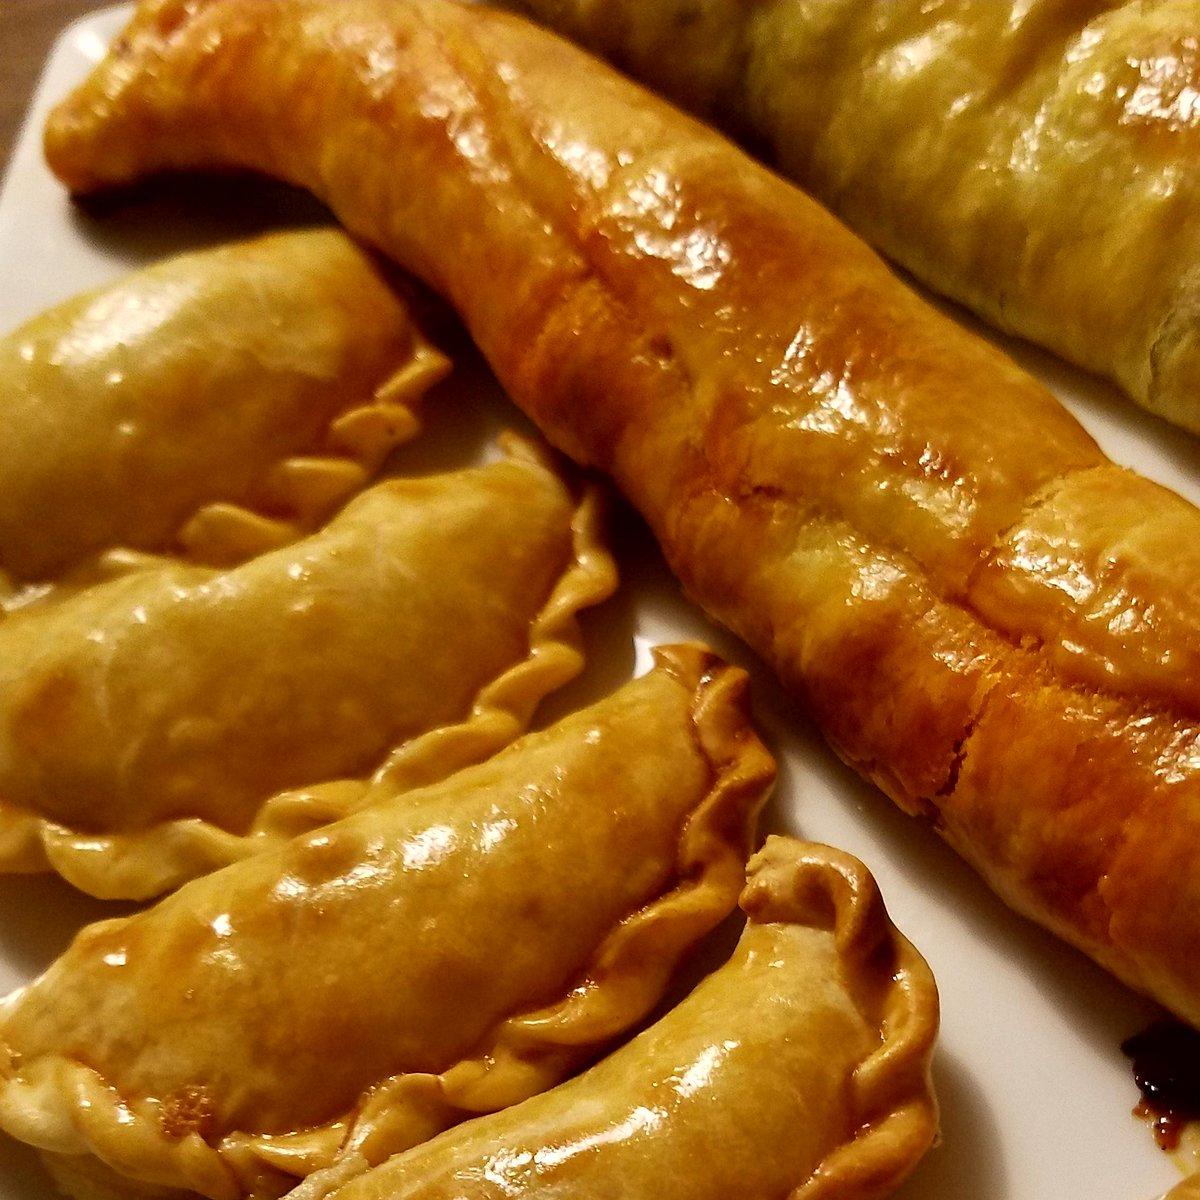 Delicious! When different traditions work wonders #empanas #empanadasdemaiz #rollosdeespinacas #rollosdesobrasada #deliciousfood #worldfood #traditionalfood #creativefood #newrecipes #empanadascruceñas #santacruzbolivia #palmademallorca #Spain #Bolivia @smygoodness https://t.co/jm8p4FZ0V8